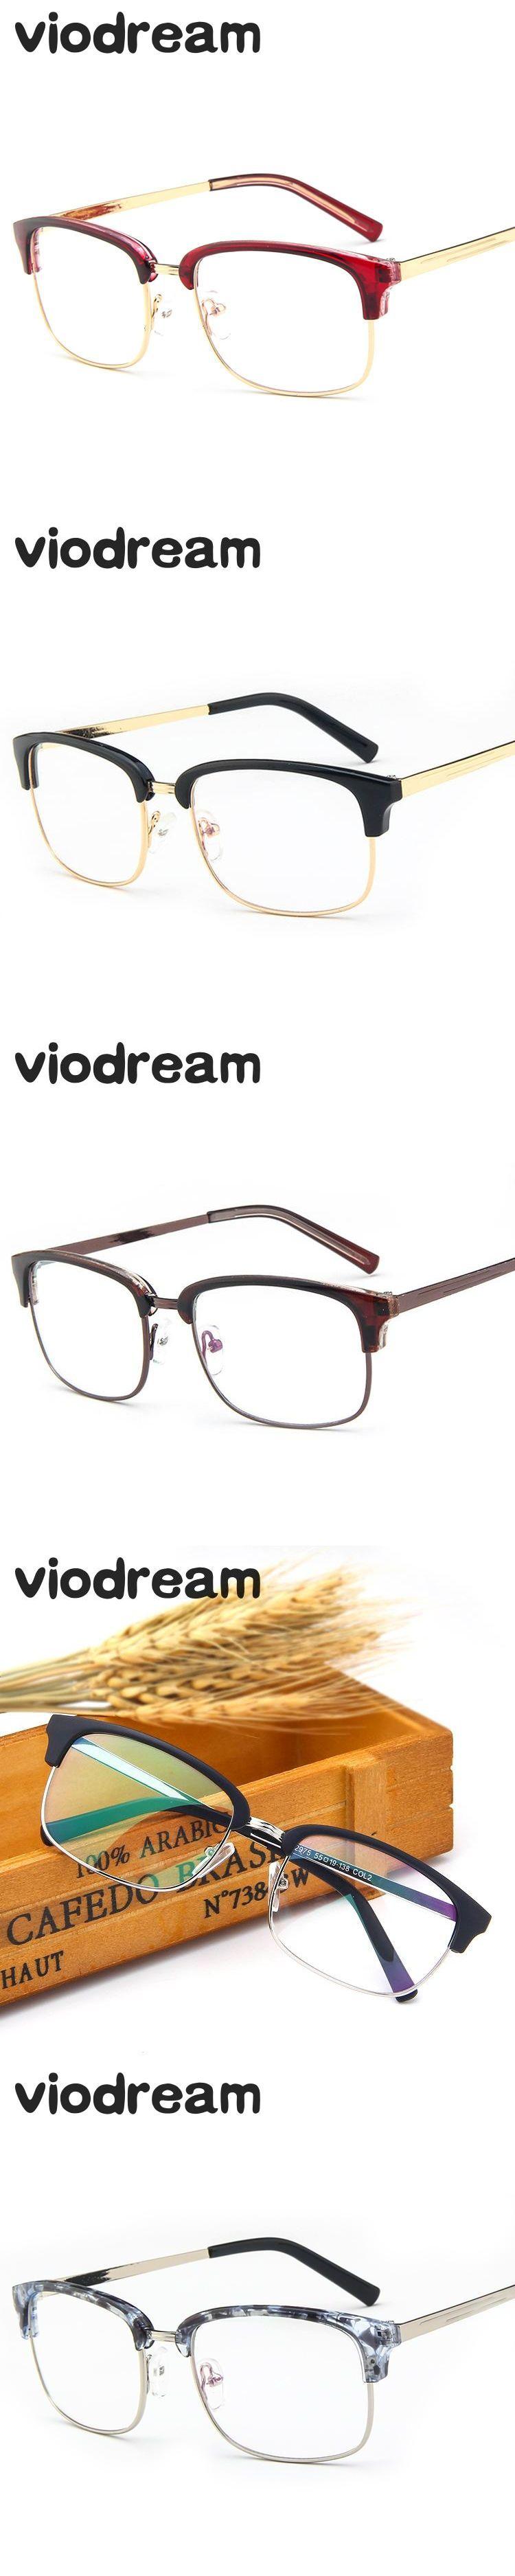 06737d22f66 Eyeglasses · Viodream Plastic Titanium Fashion Half Glasses Frame Optical  Glasses Frame Prescription Eyewear Reading Glasses Oculos De